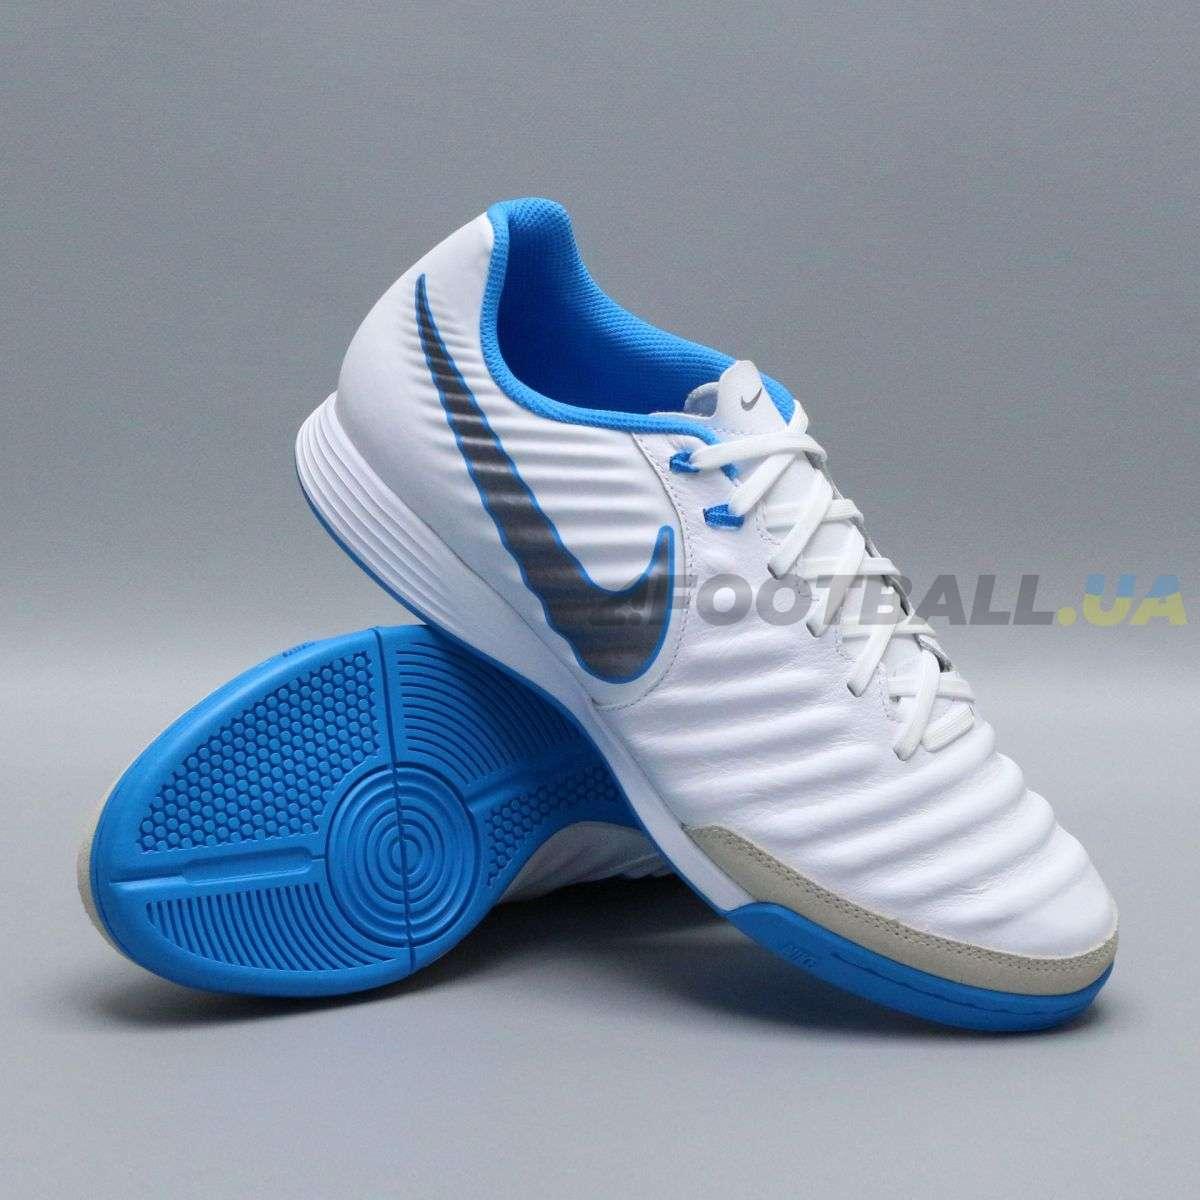 🥇 Футзалки Nike Tiempo — купить обувь бутсы для футзала Найк Темпо ... f3bc9da53ec88